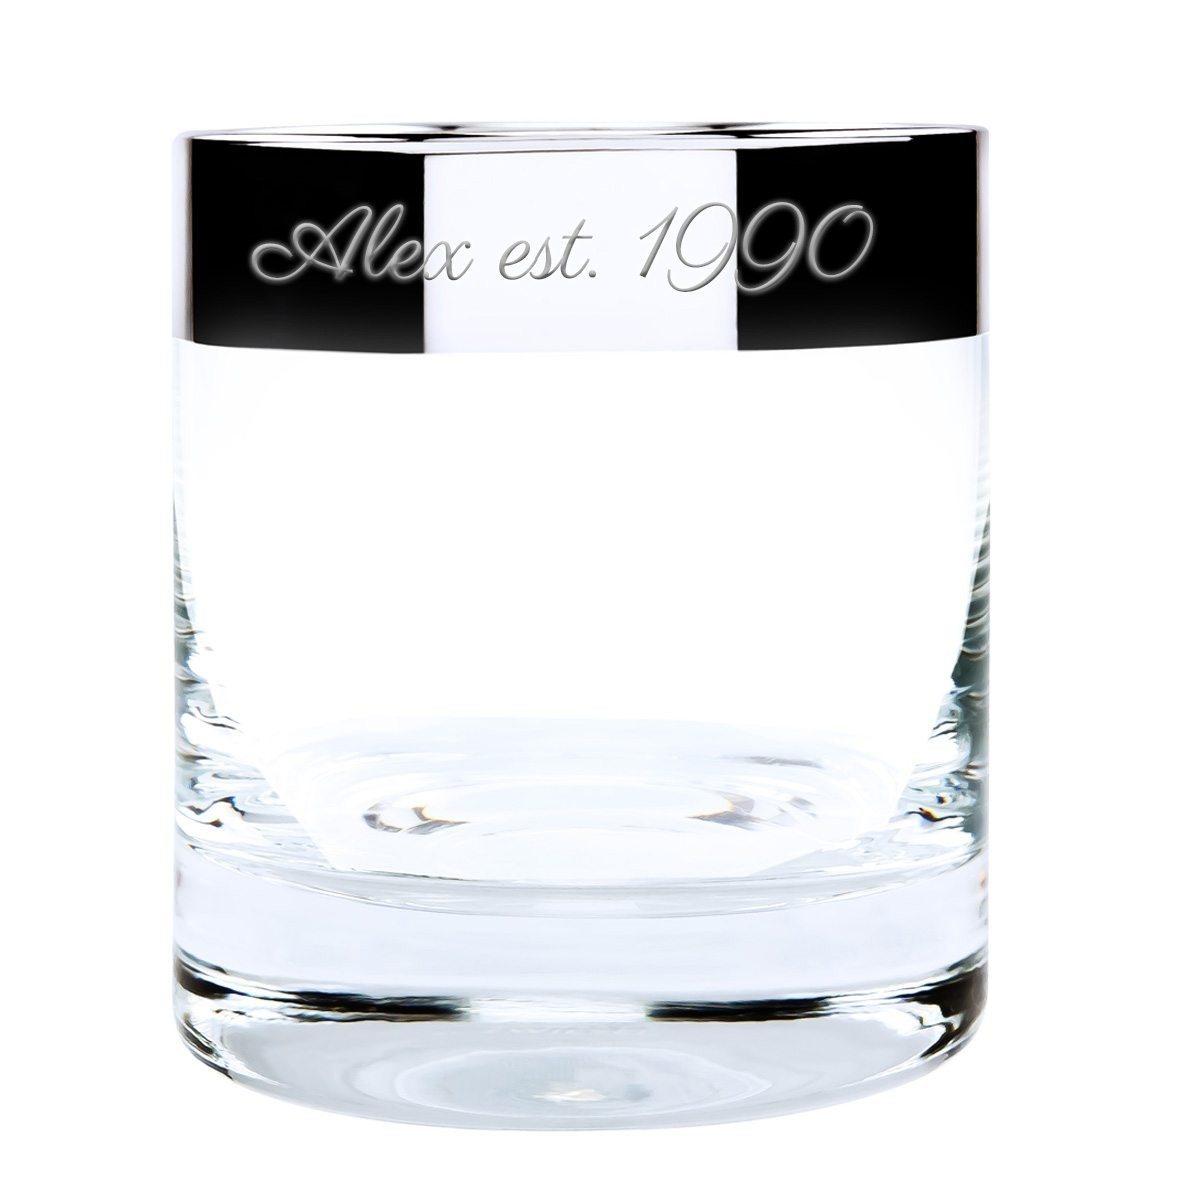 Edles Whiskyglas mit echtem Silberrand